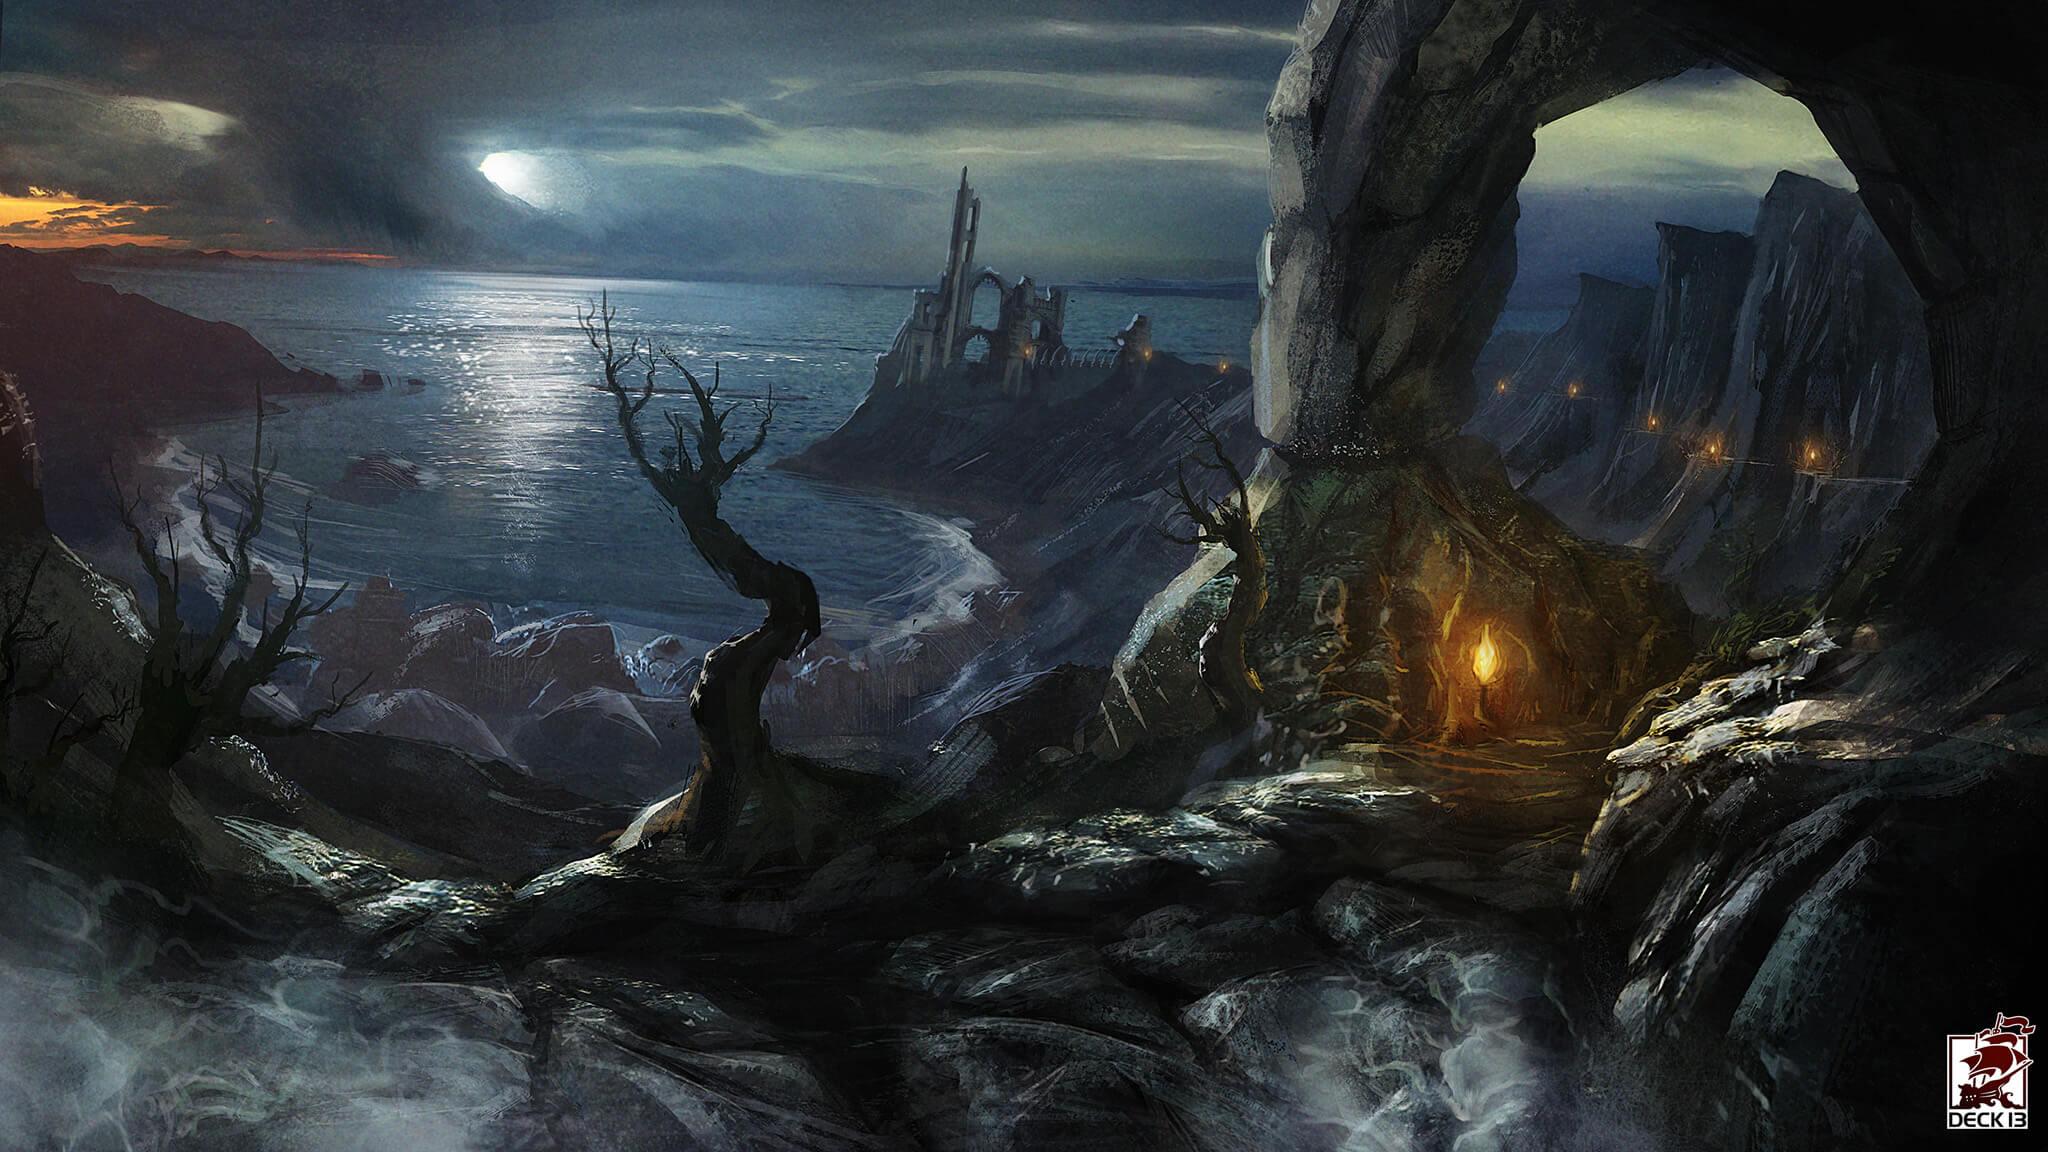 blood-knights-concept-art-felix-haas-cliff-mood-003